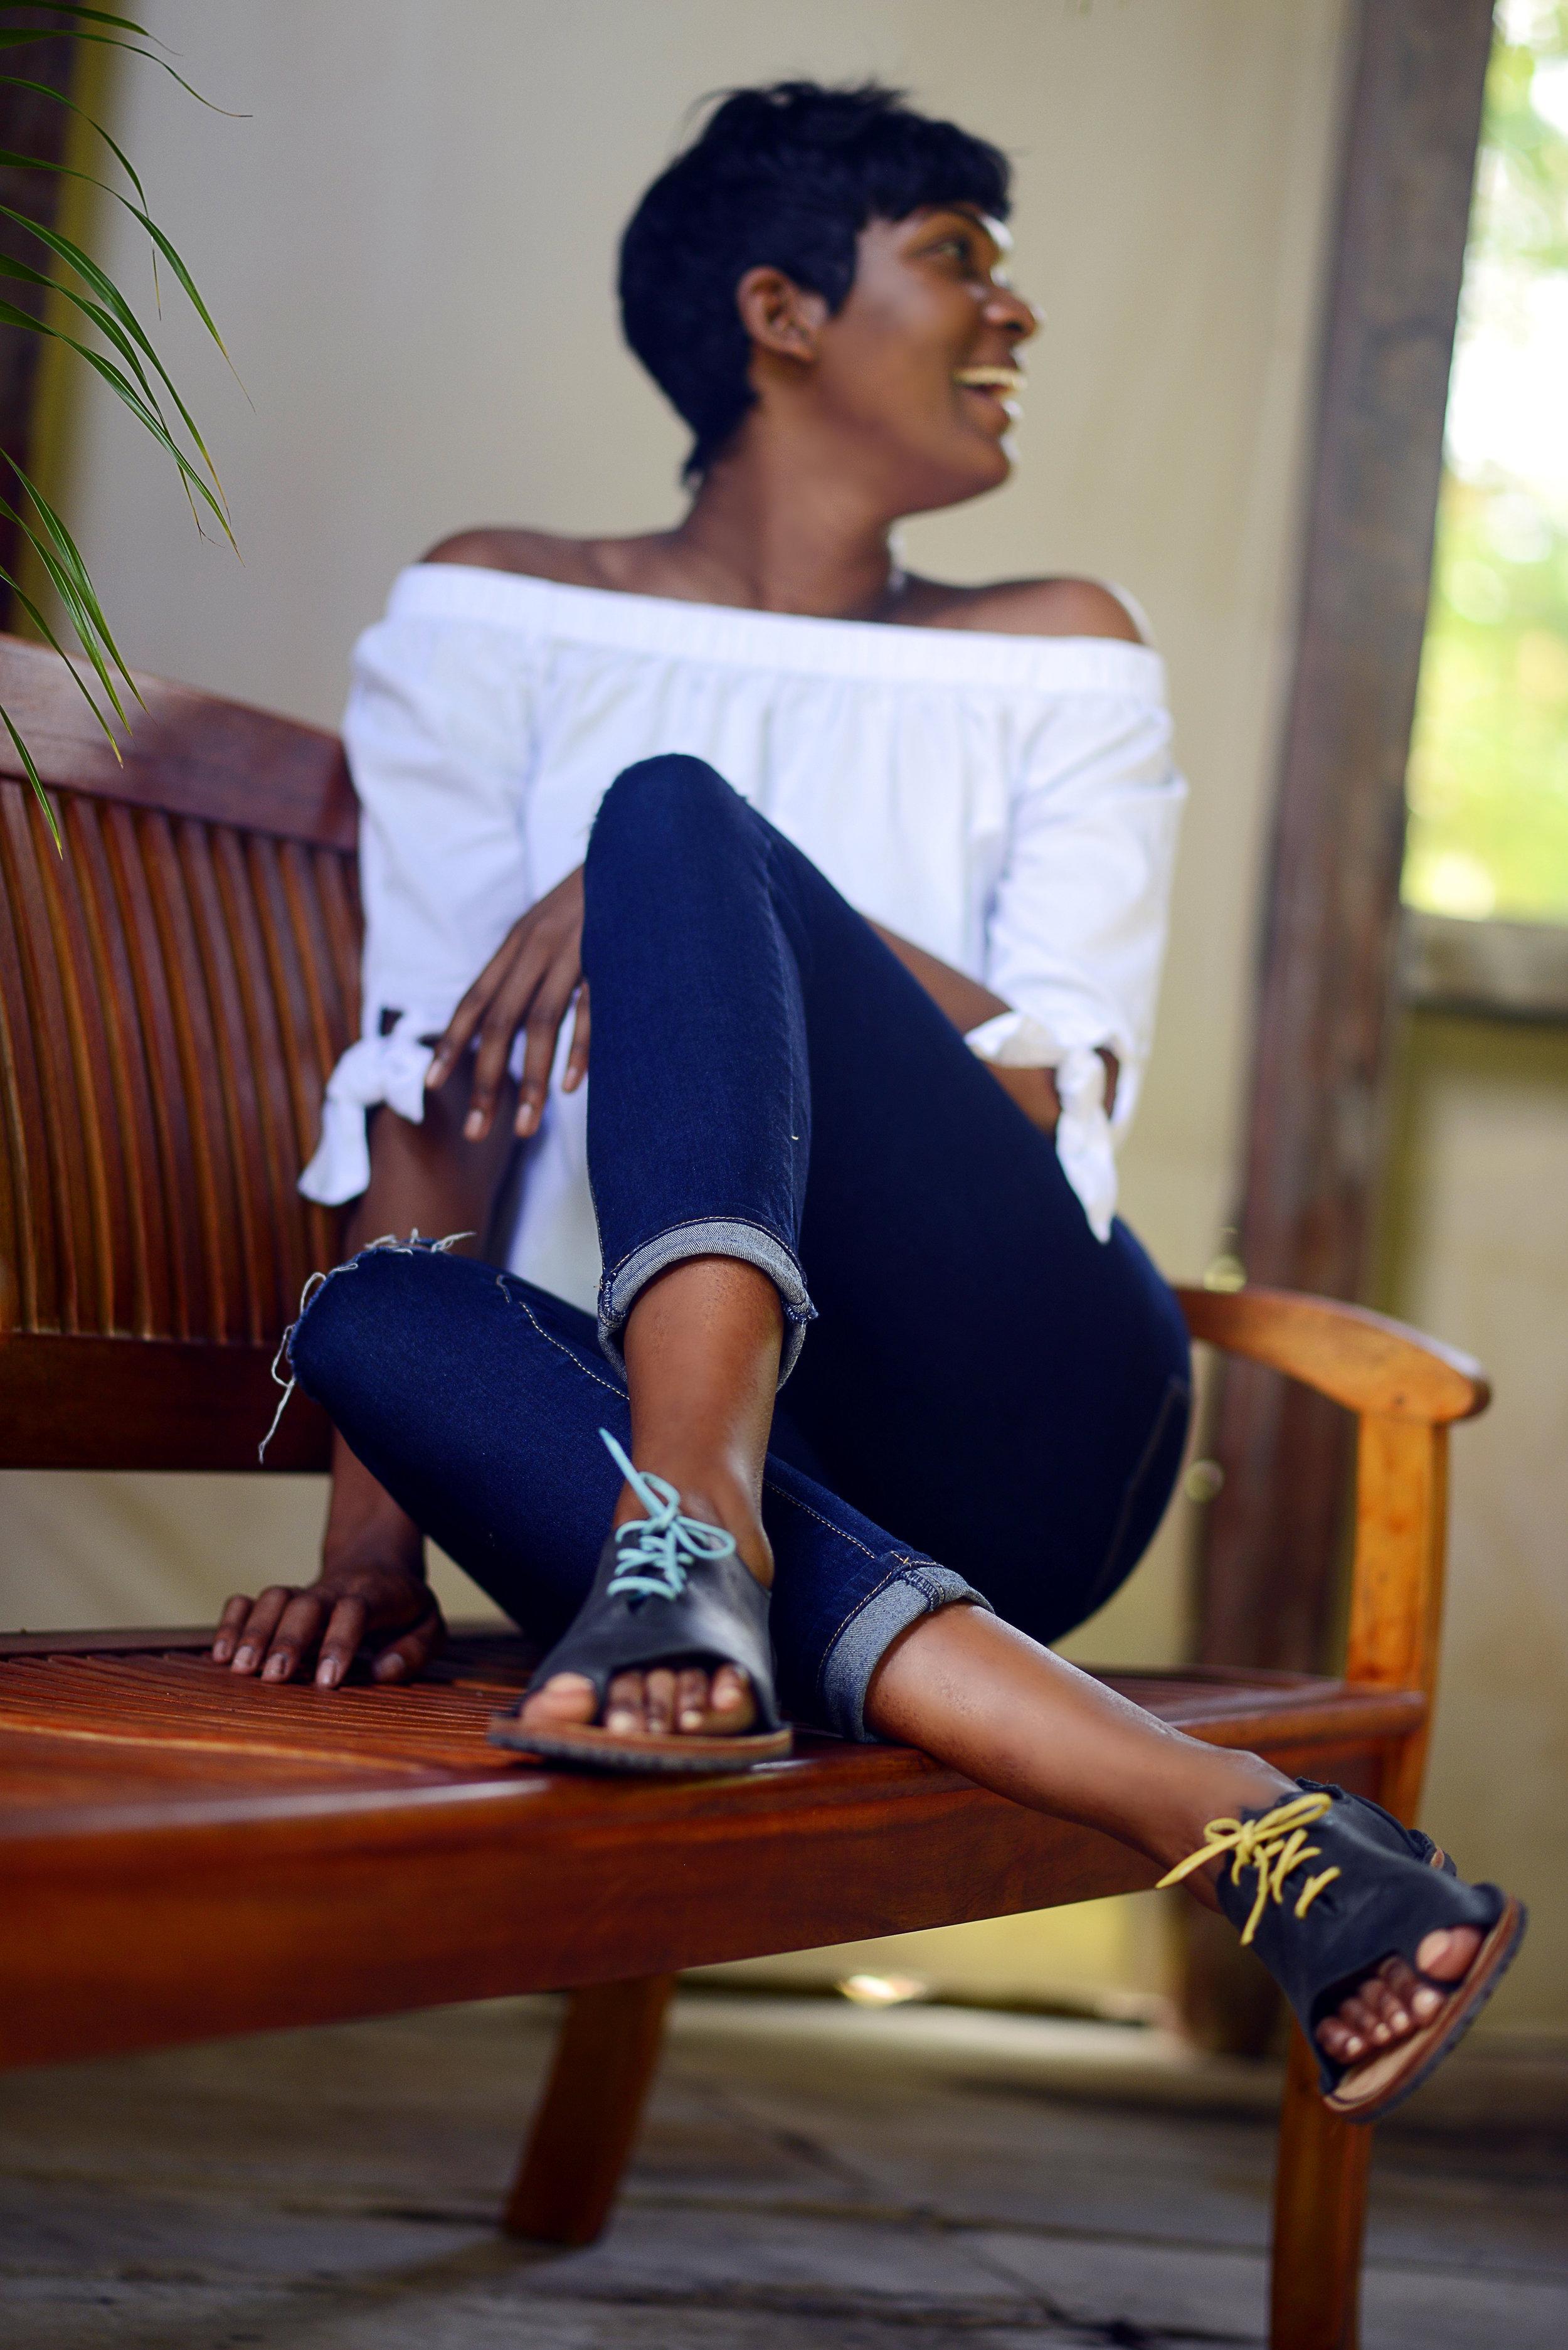 see more in our fashion portfolio..